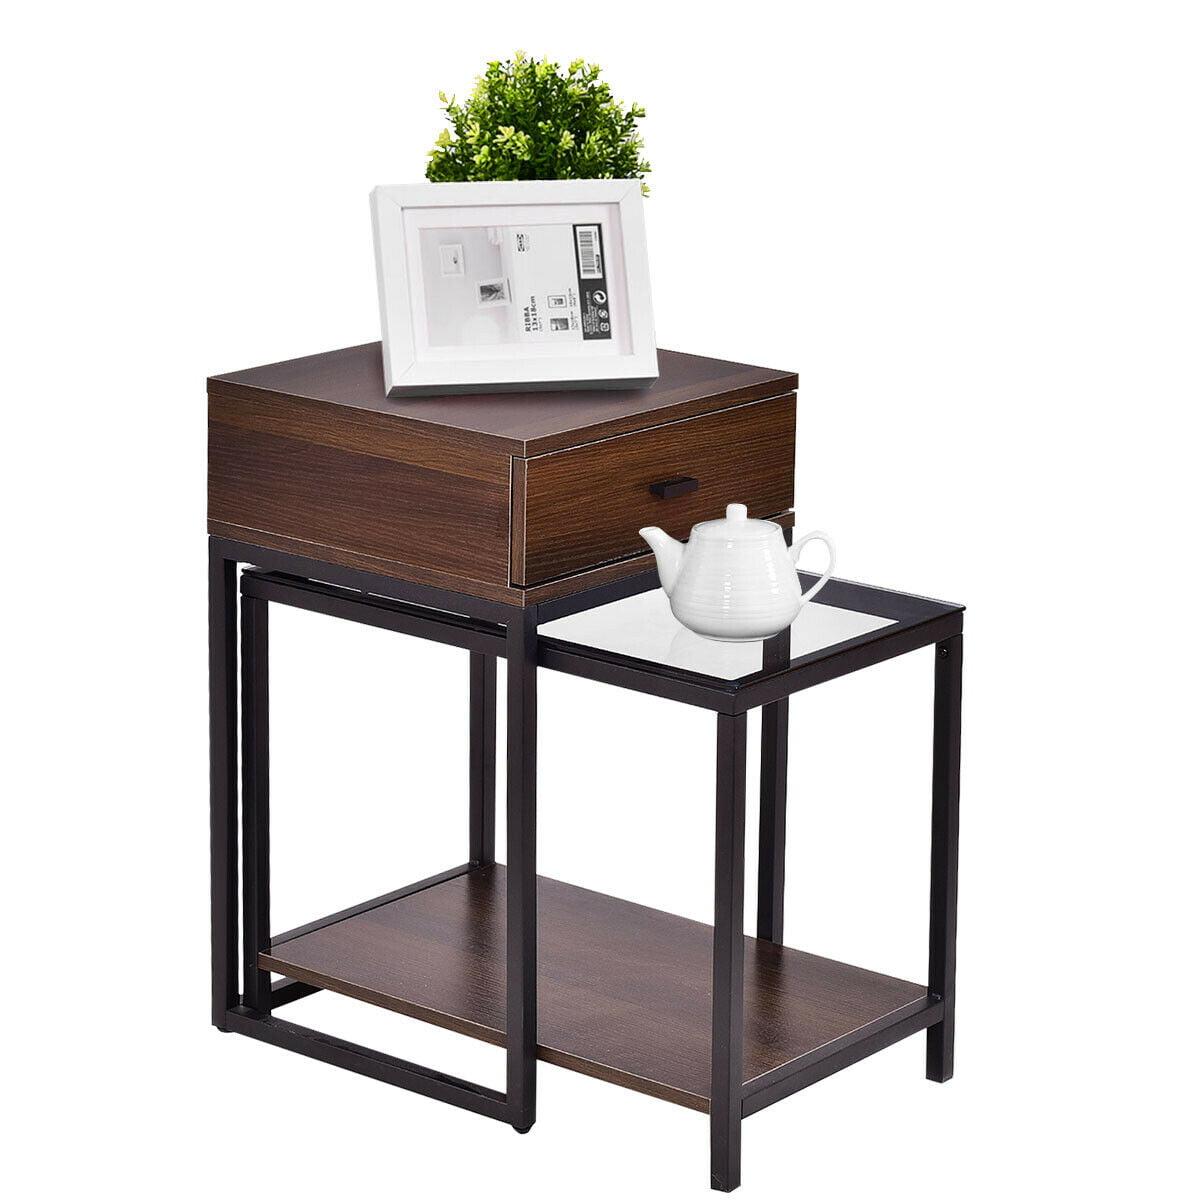 Gymax 2 Pc Metal Frame Wood Glass Top Nesting Table Coffee Table Side End Table Walmart Com Walmart Com